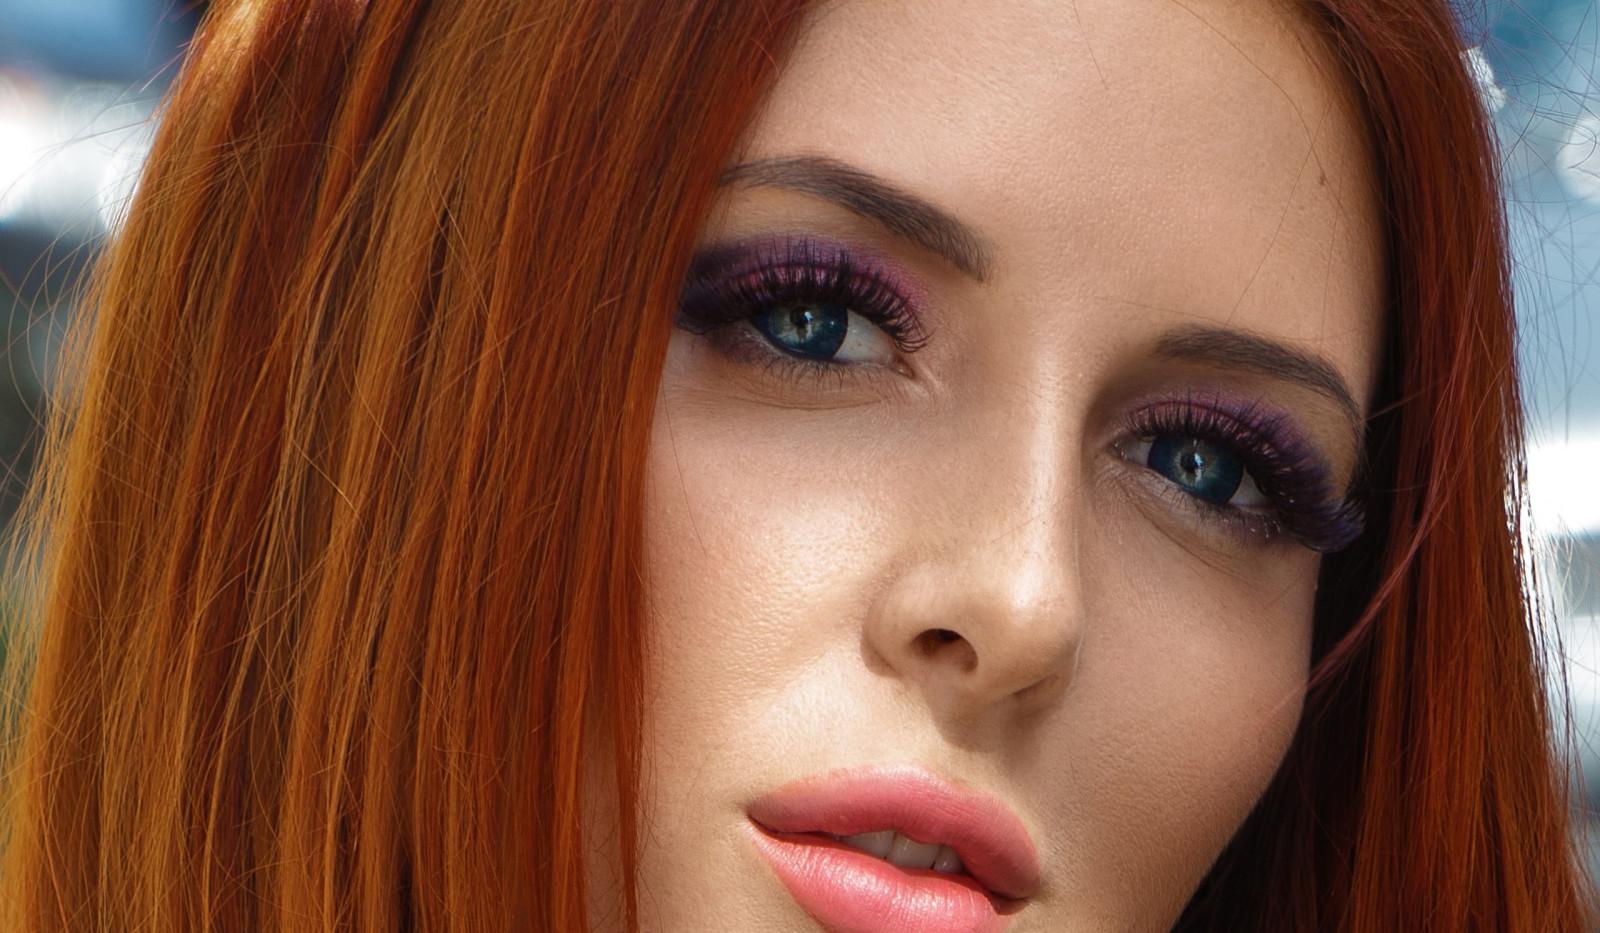 Red Lipstick Brown Hair Blue Eyes: Wallpaper : Face, Women, Redhead, Model, Portrait, Long